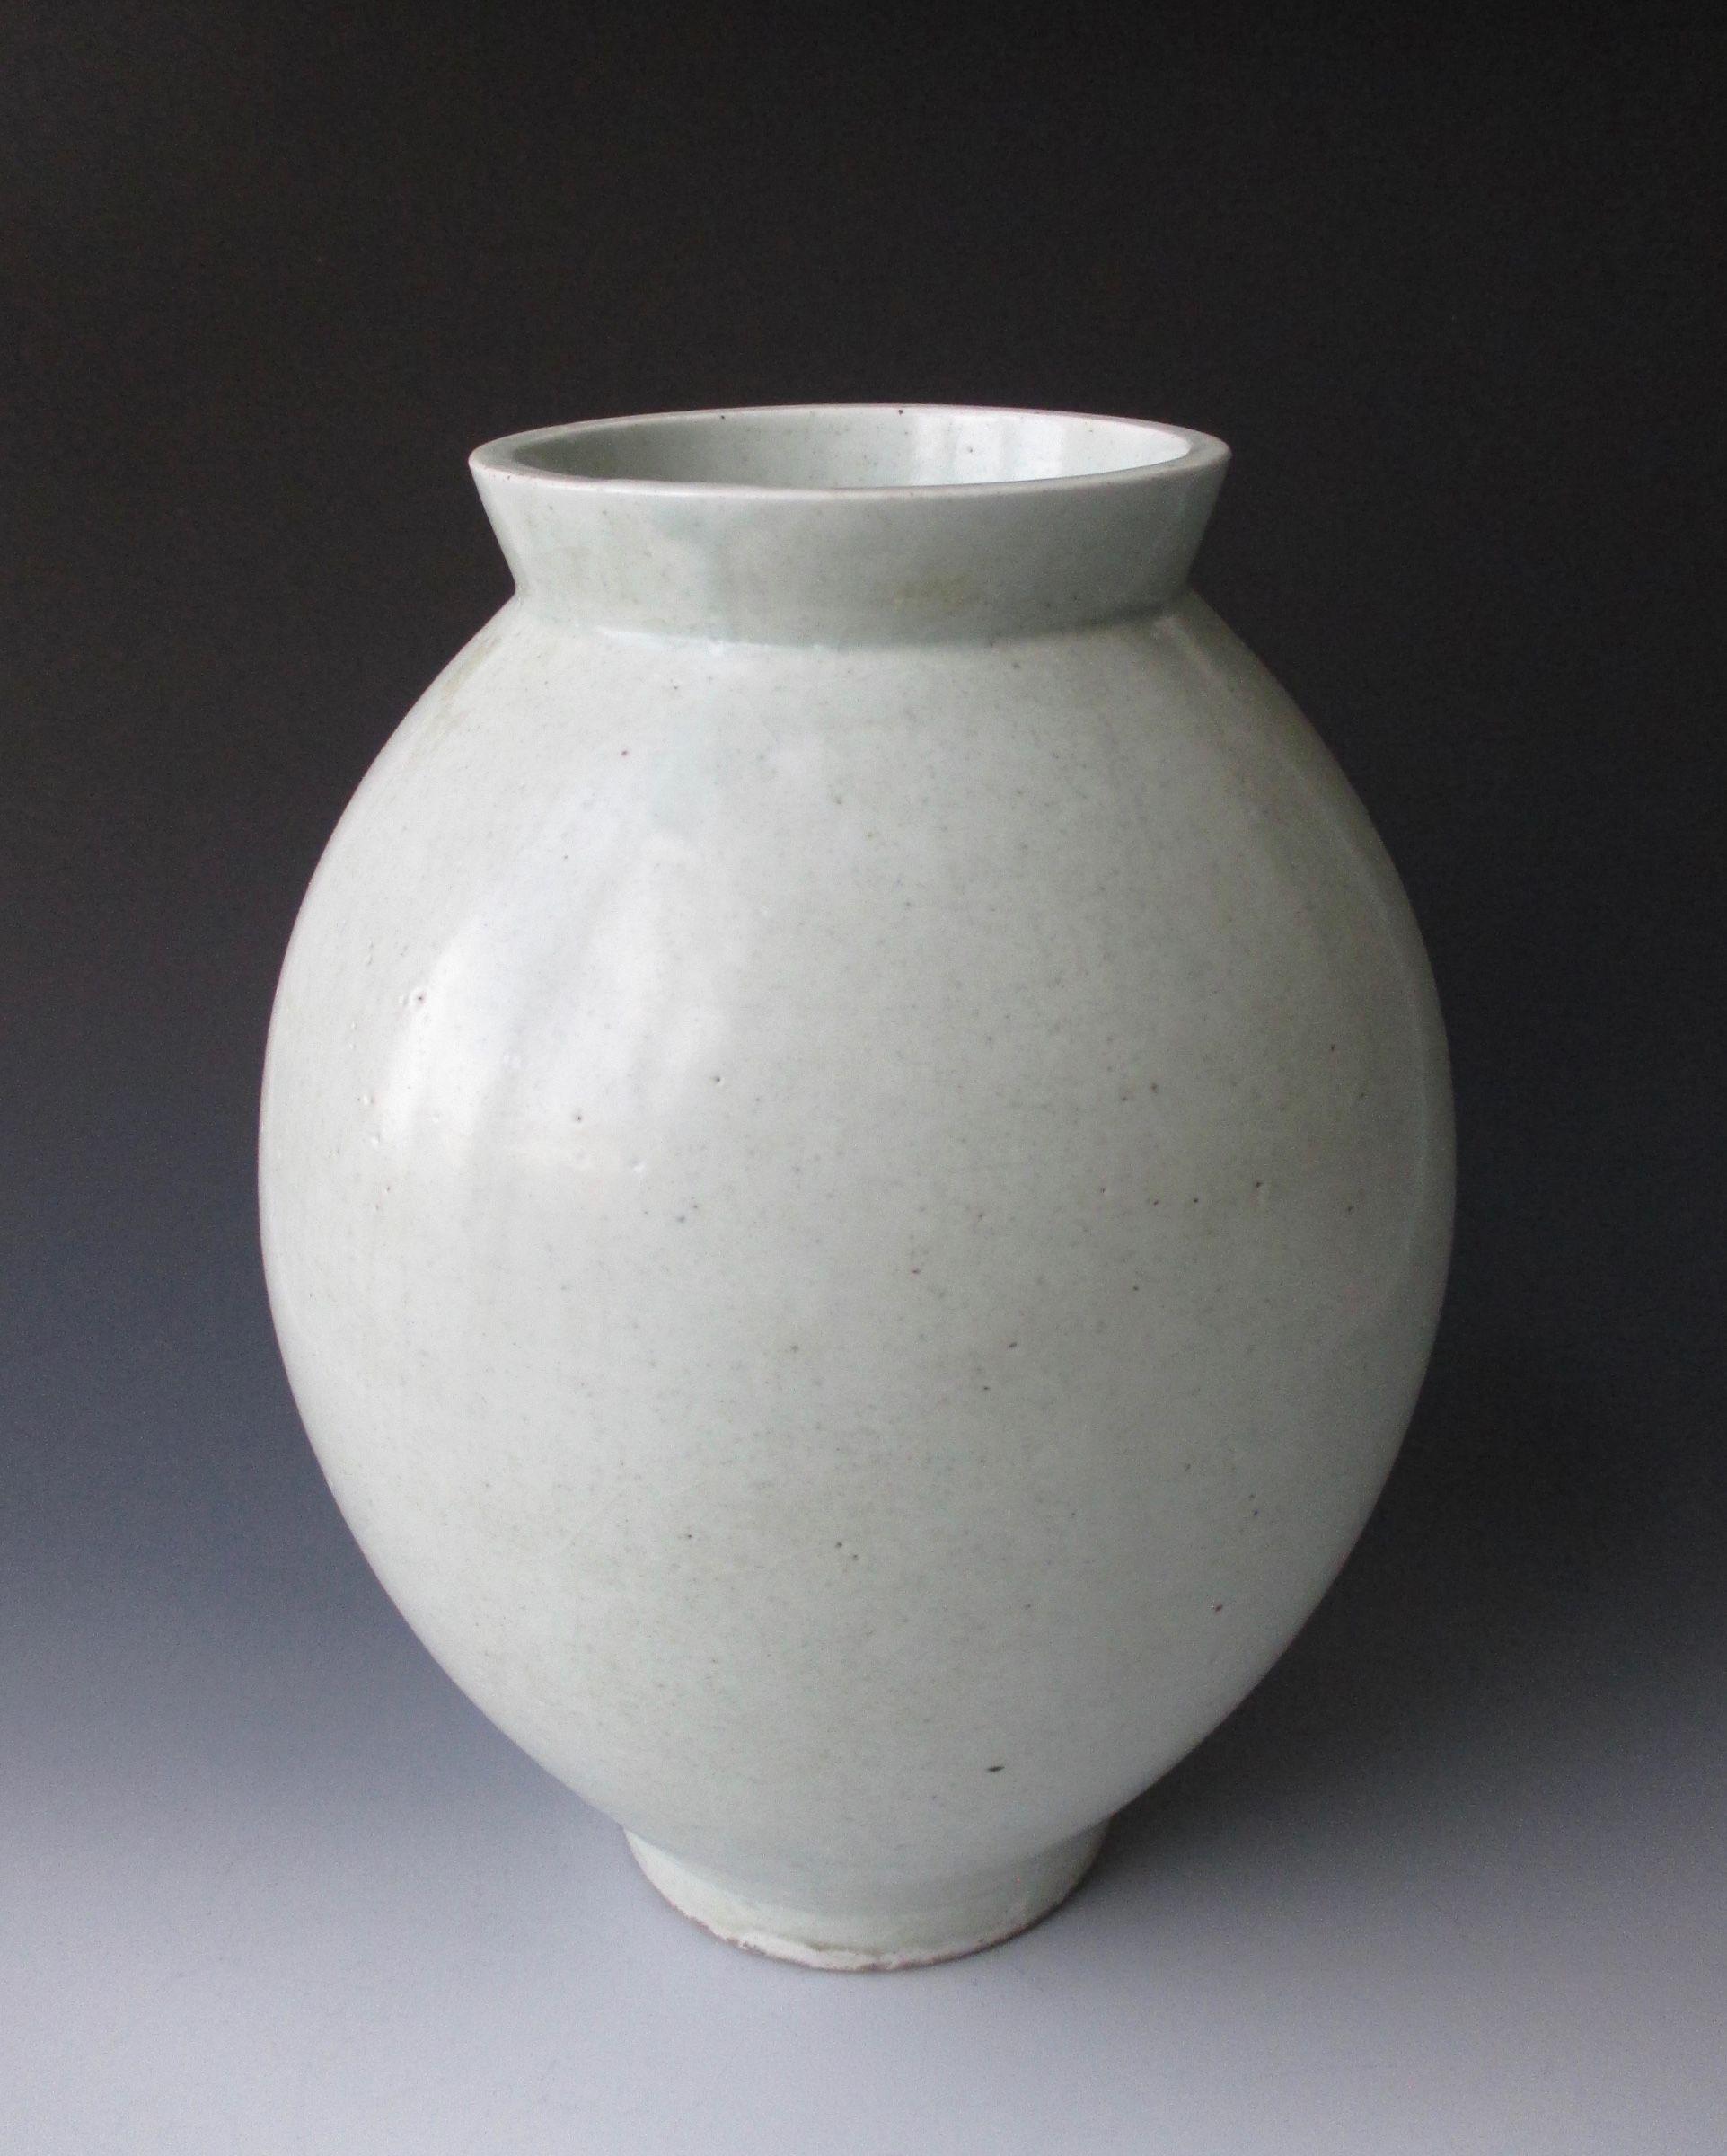 Korean Antique White Porcelain Moon Vase, 18th Century